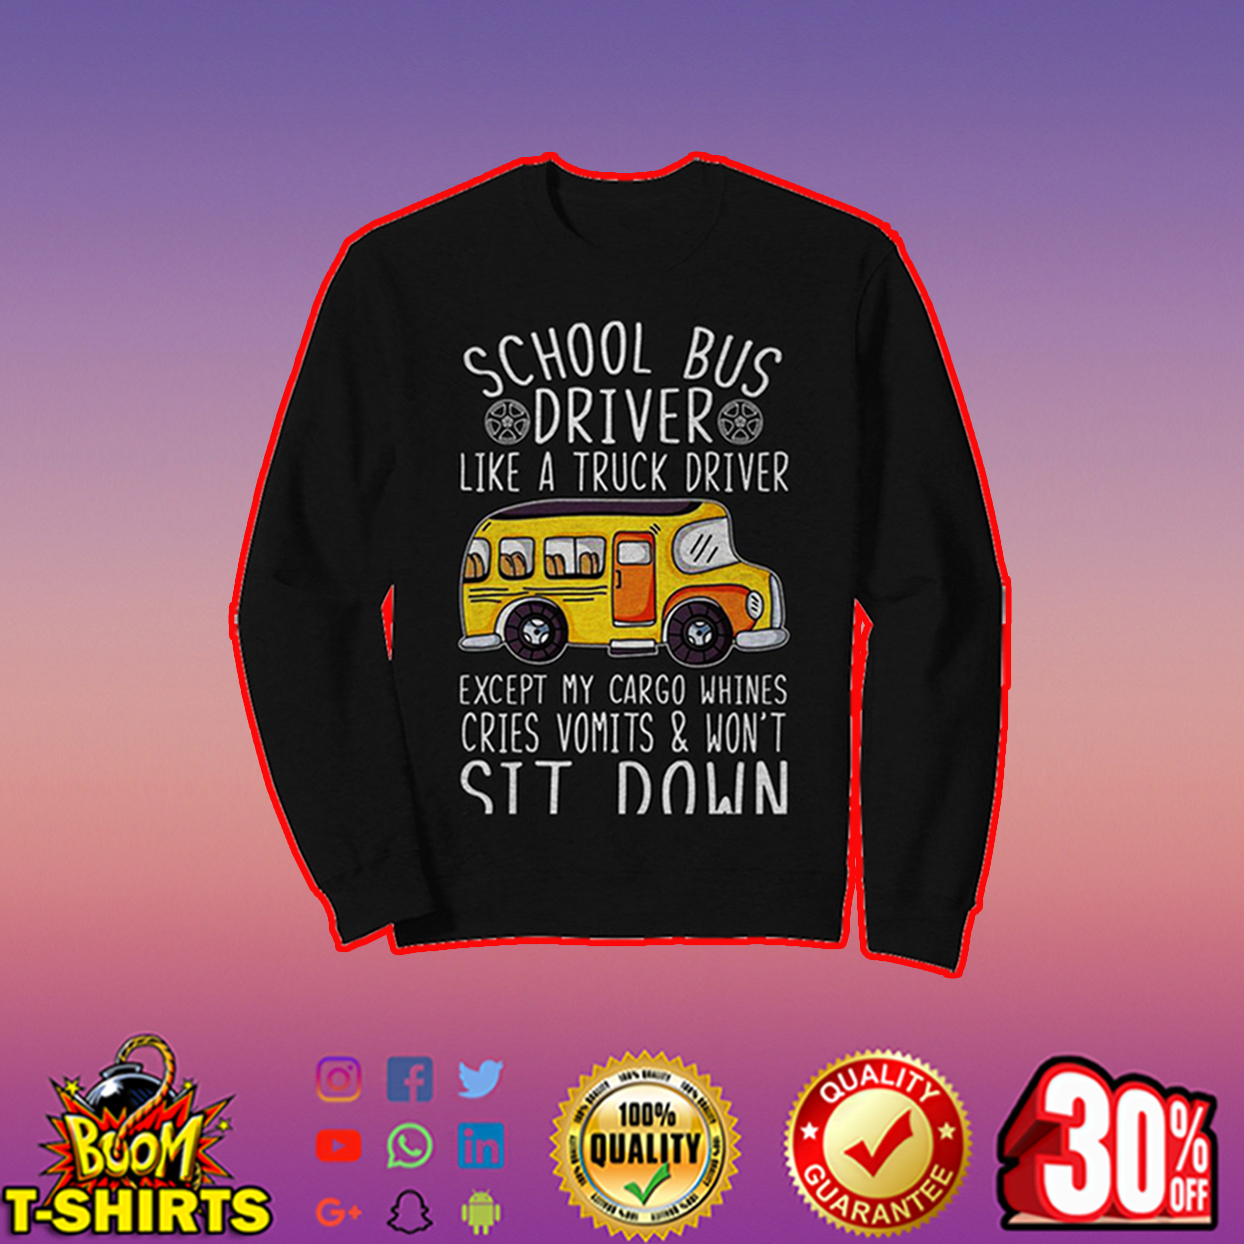 School bus driver like a truck driver sweatshirt